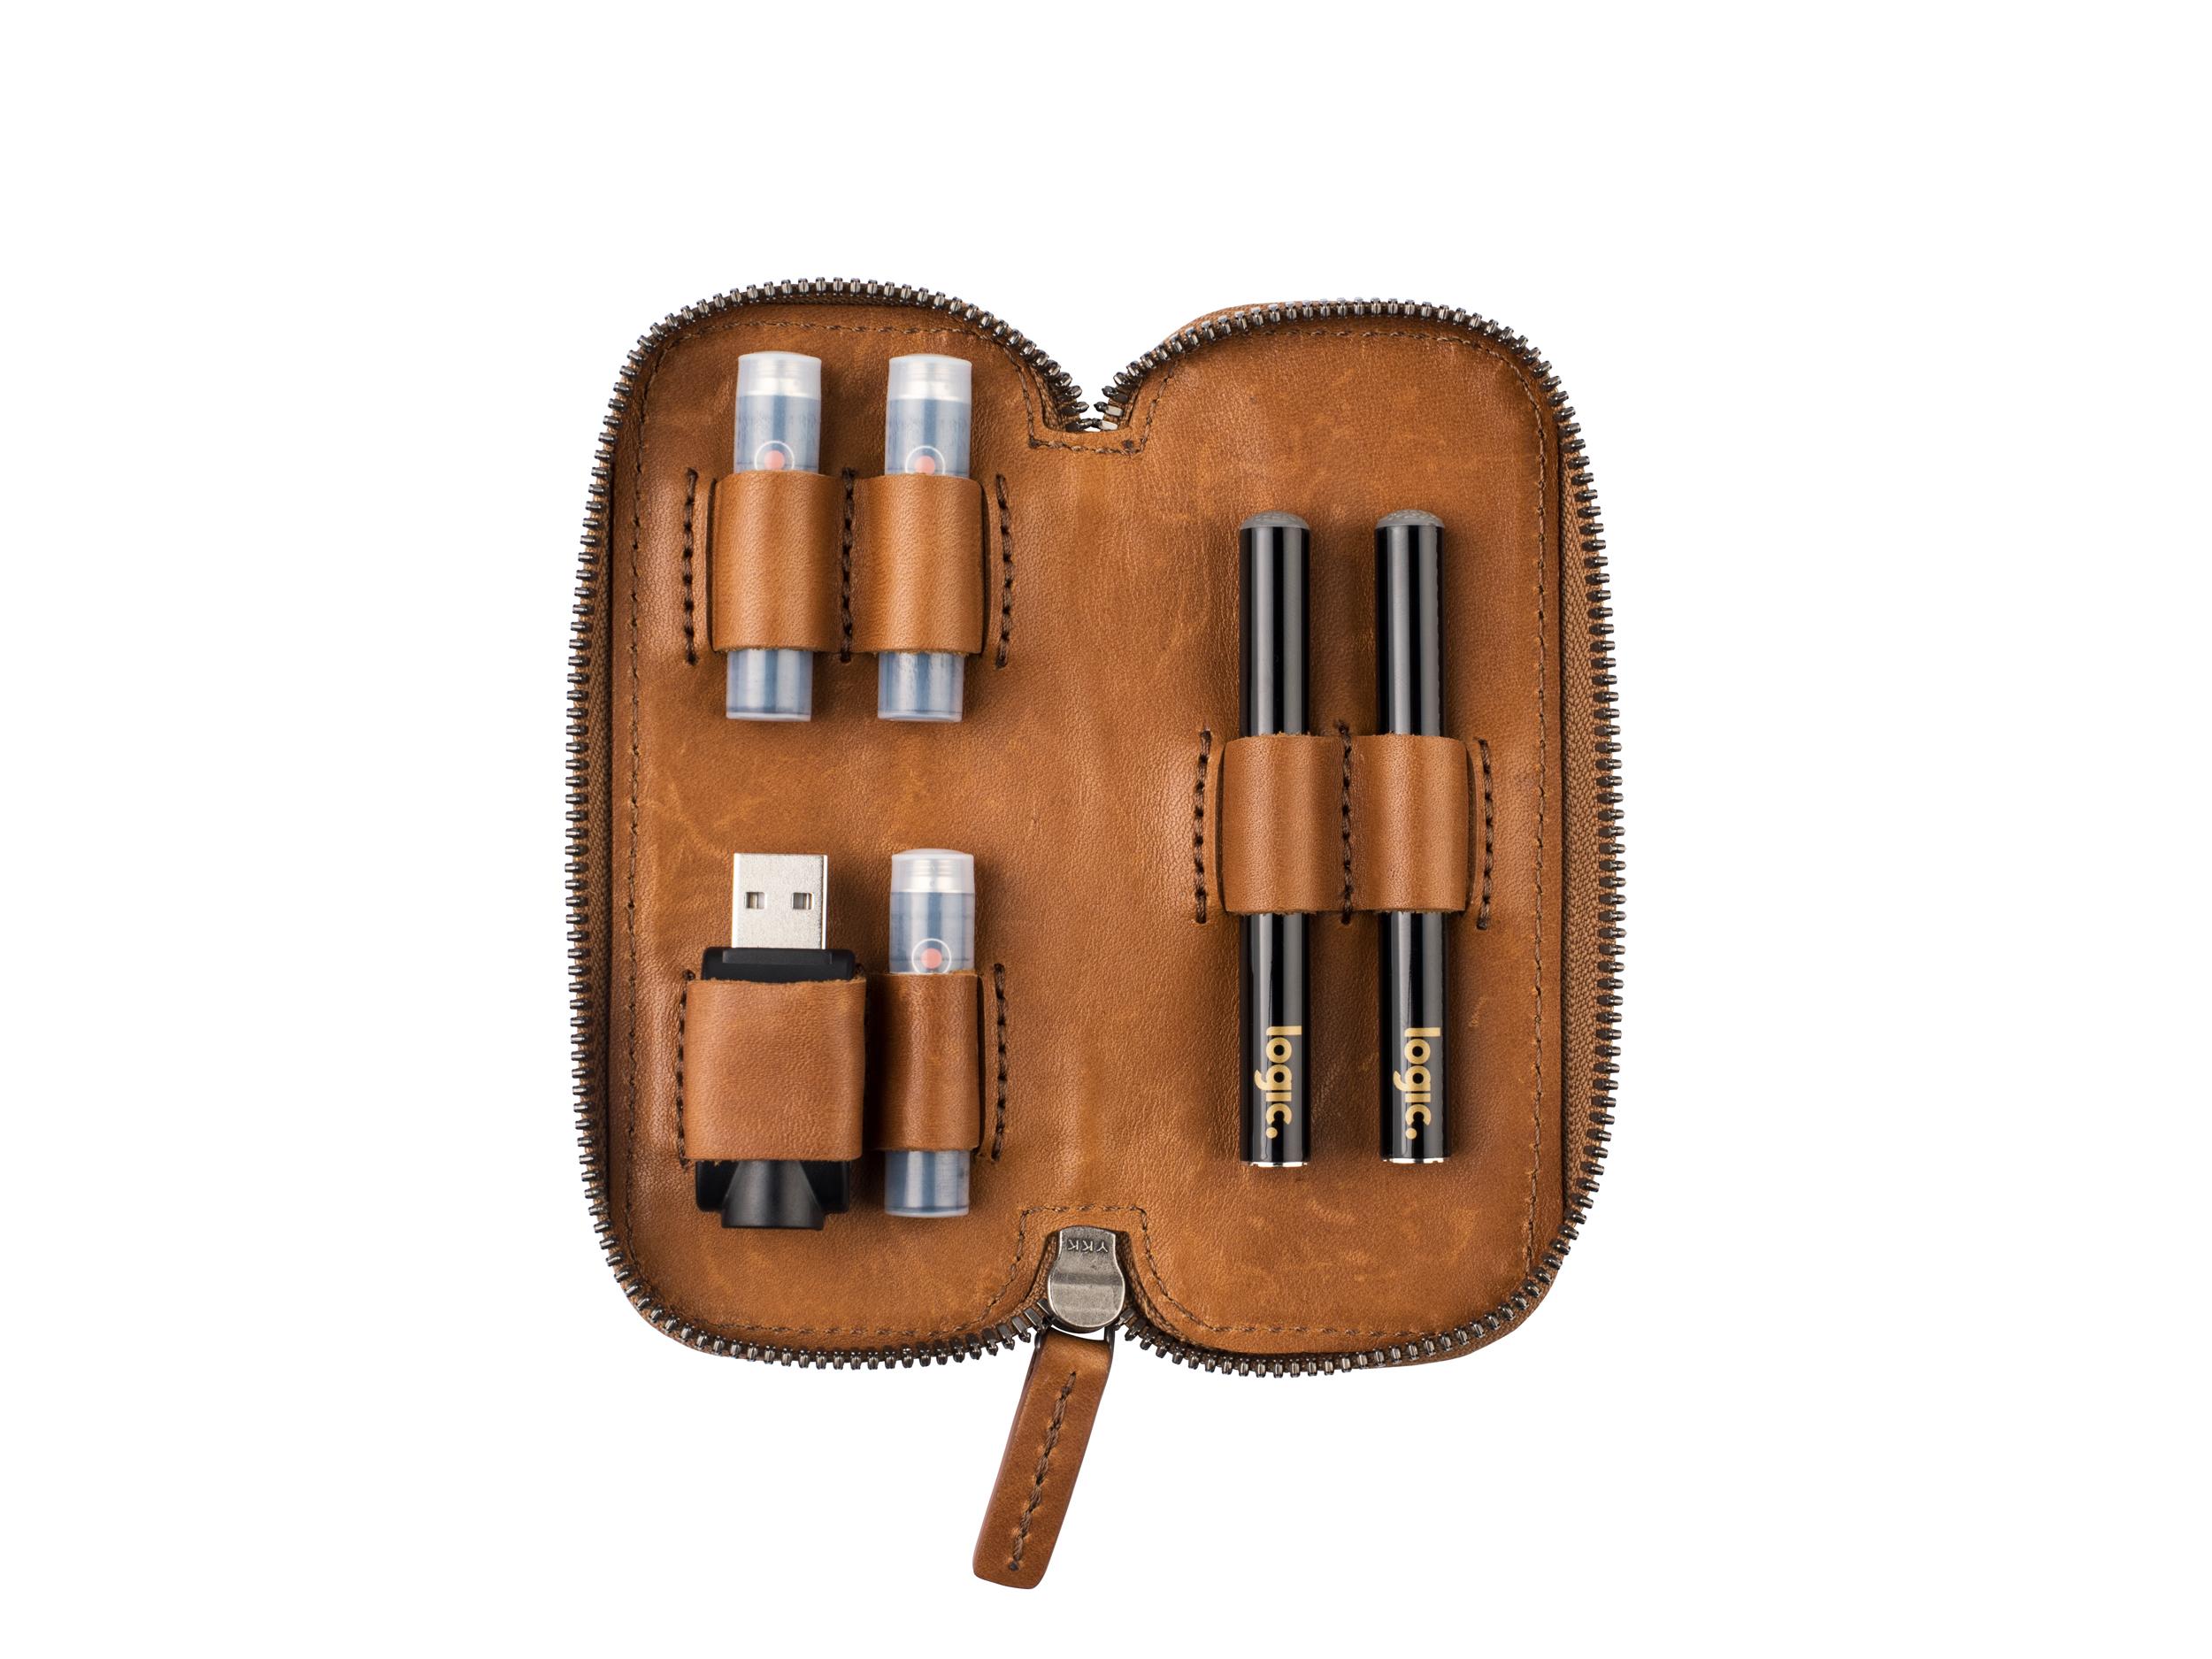 Logic Vape Leather Case (Small)